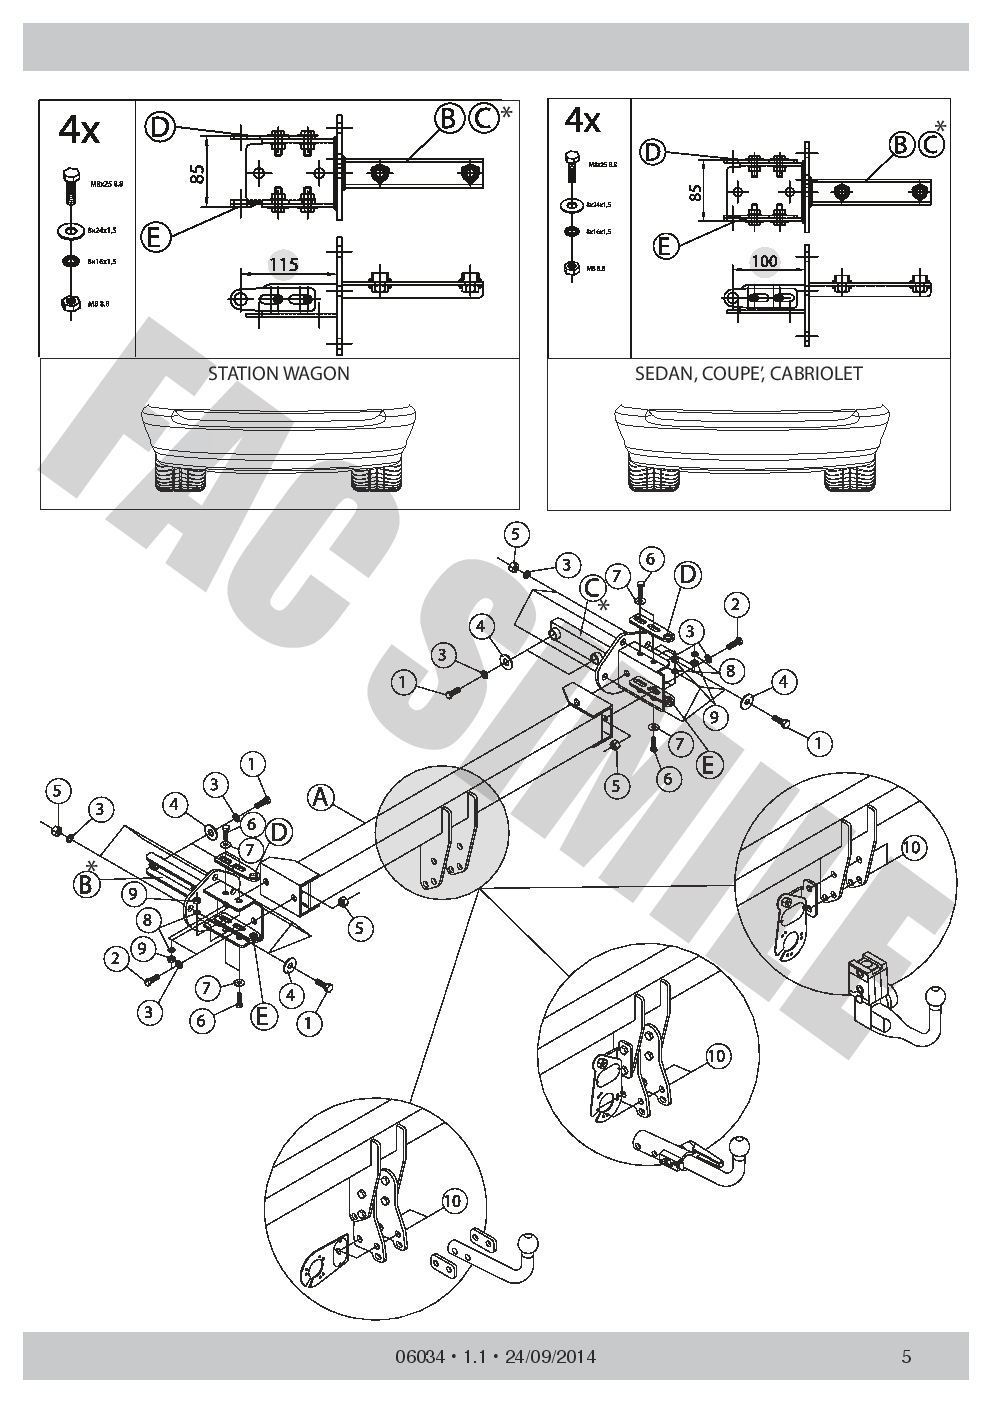 DIAGRAM] Bmw 3 Series Tow Bar Wiring Diagram FULL Version HD Quality Wiring  Diagram - SXEDIAGRAMMA.GRUARINGOMME.ITgruaringomme.it